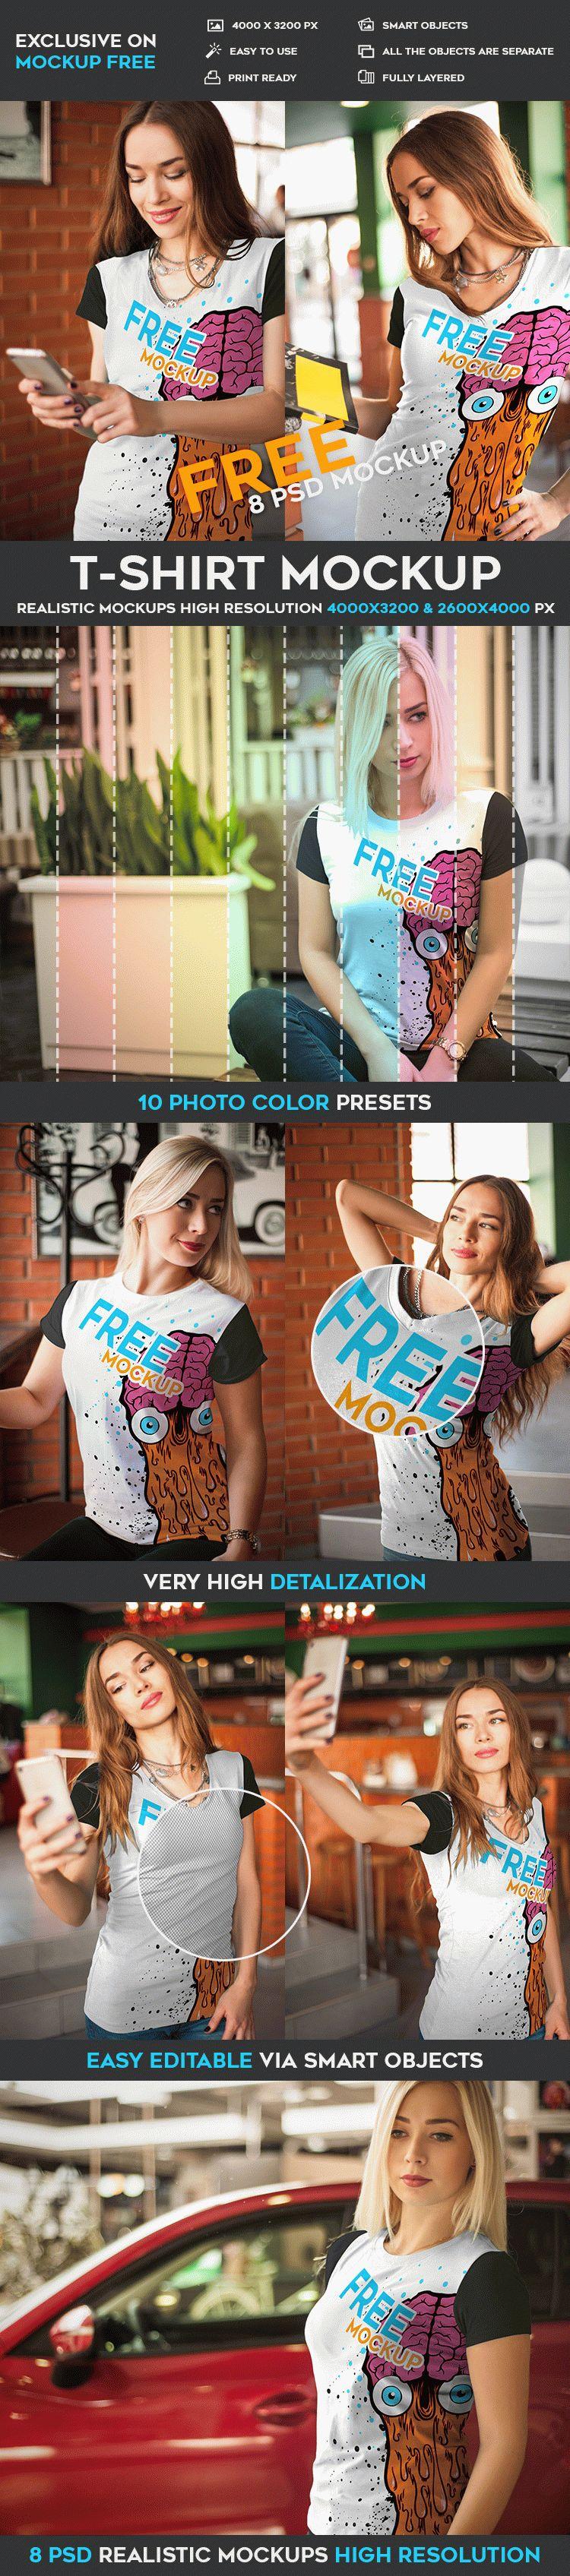 T-Shirt - 8 Free PSD Mockups